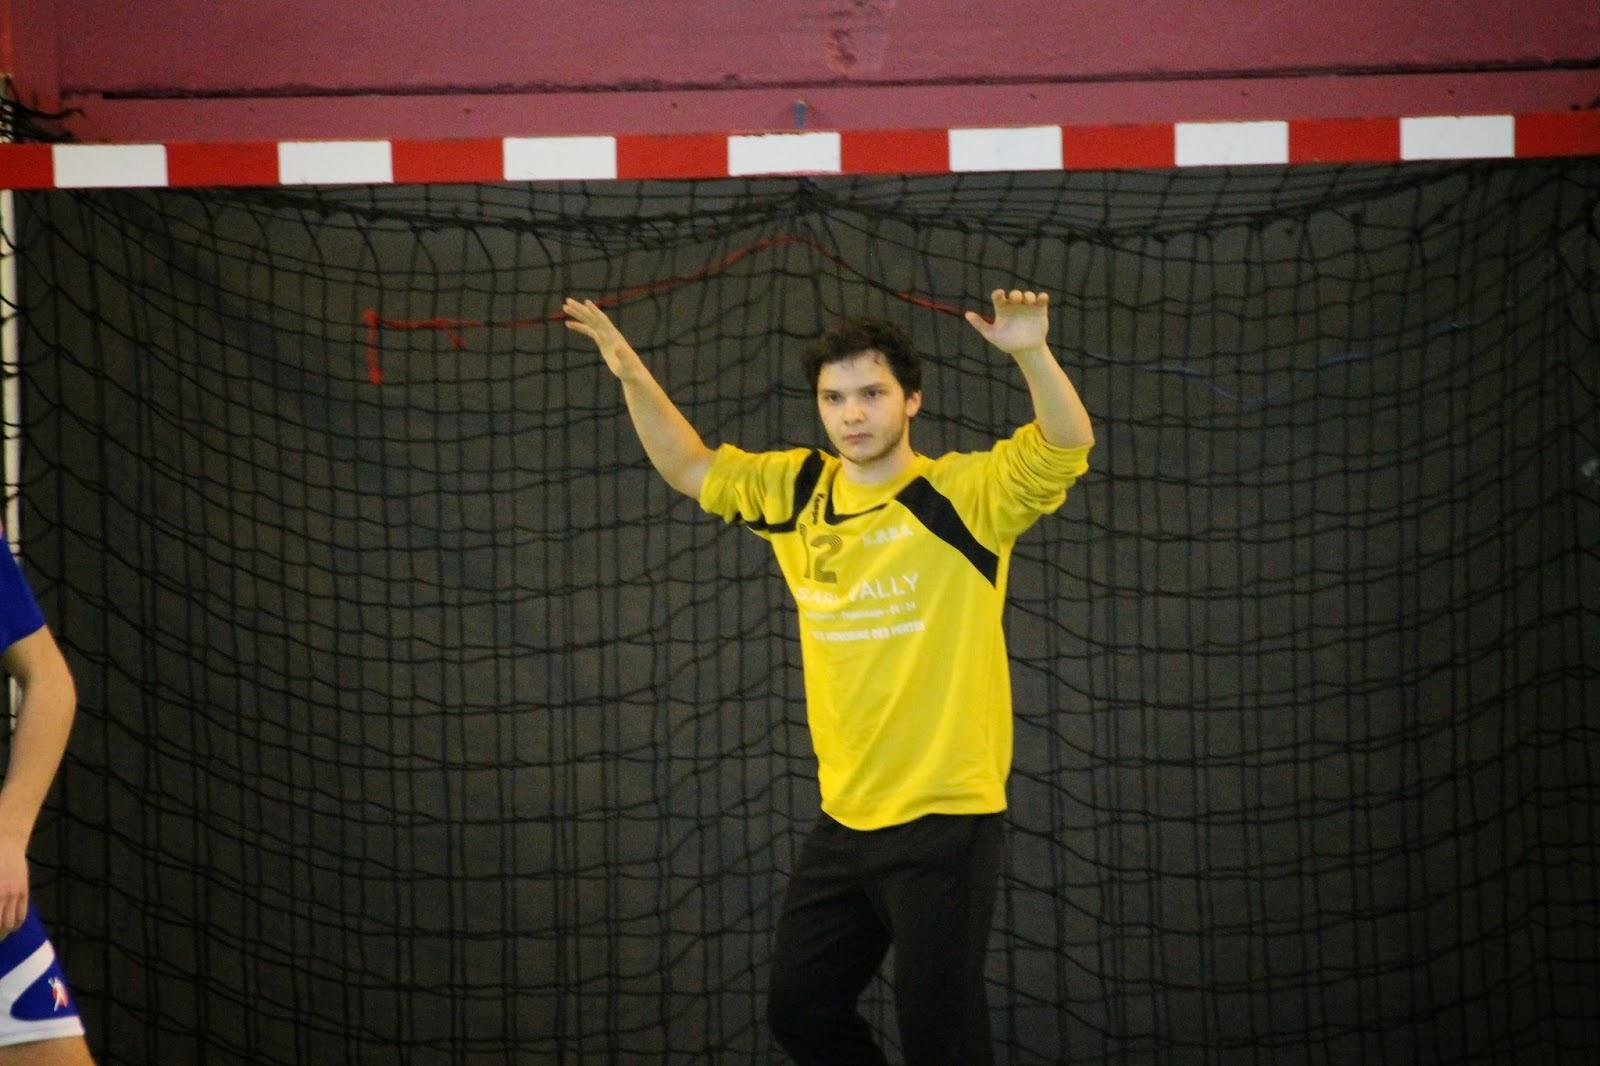 Entente port bayeux bessin handball 18g vs cherbourg for Intersport cherbourg